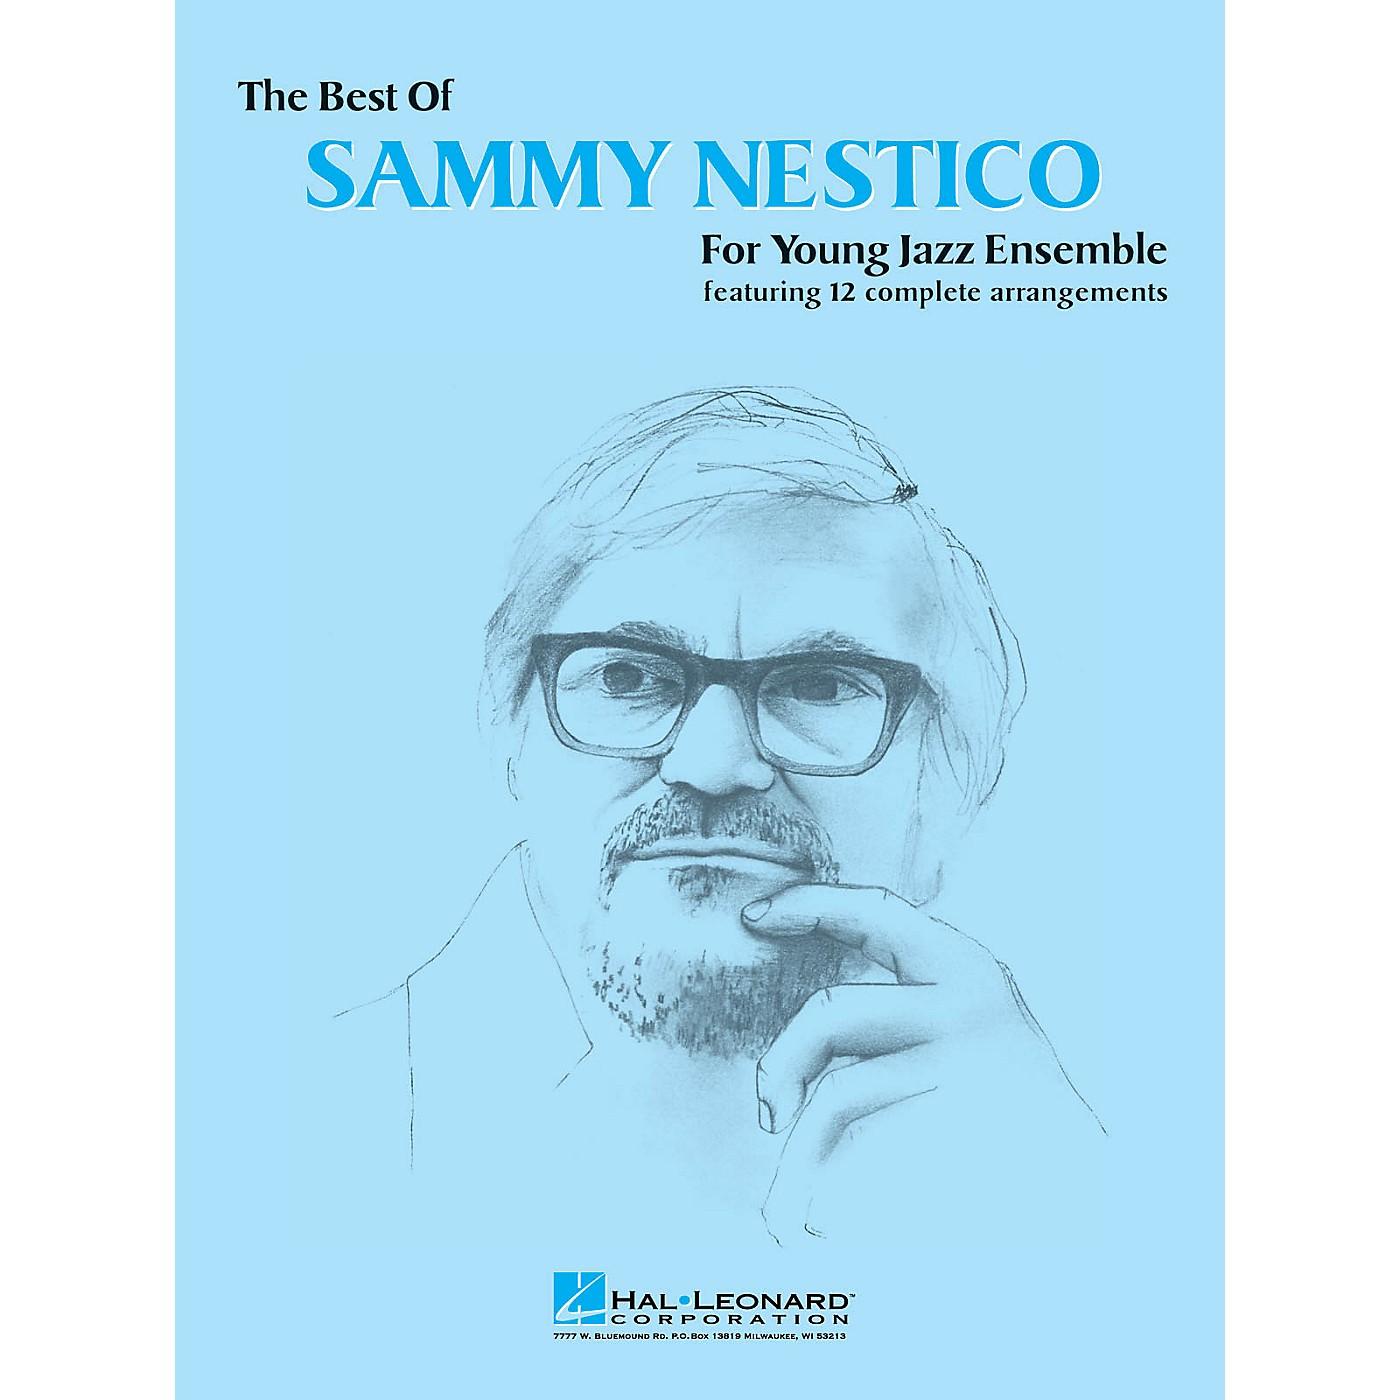 Hal Leonard The Best of Sammy Nestico - Trombone 3 Jazz Band Level 2-3 Arranged by Sammy Nestico thumbnail